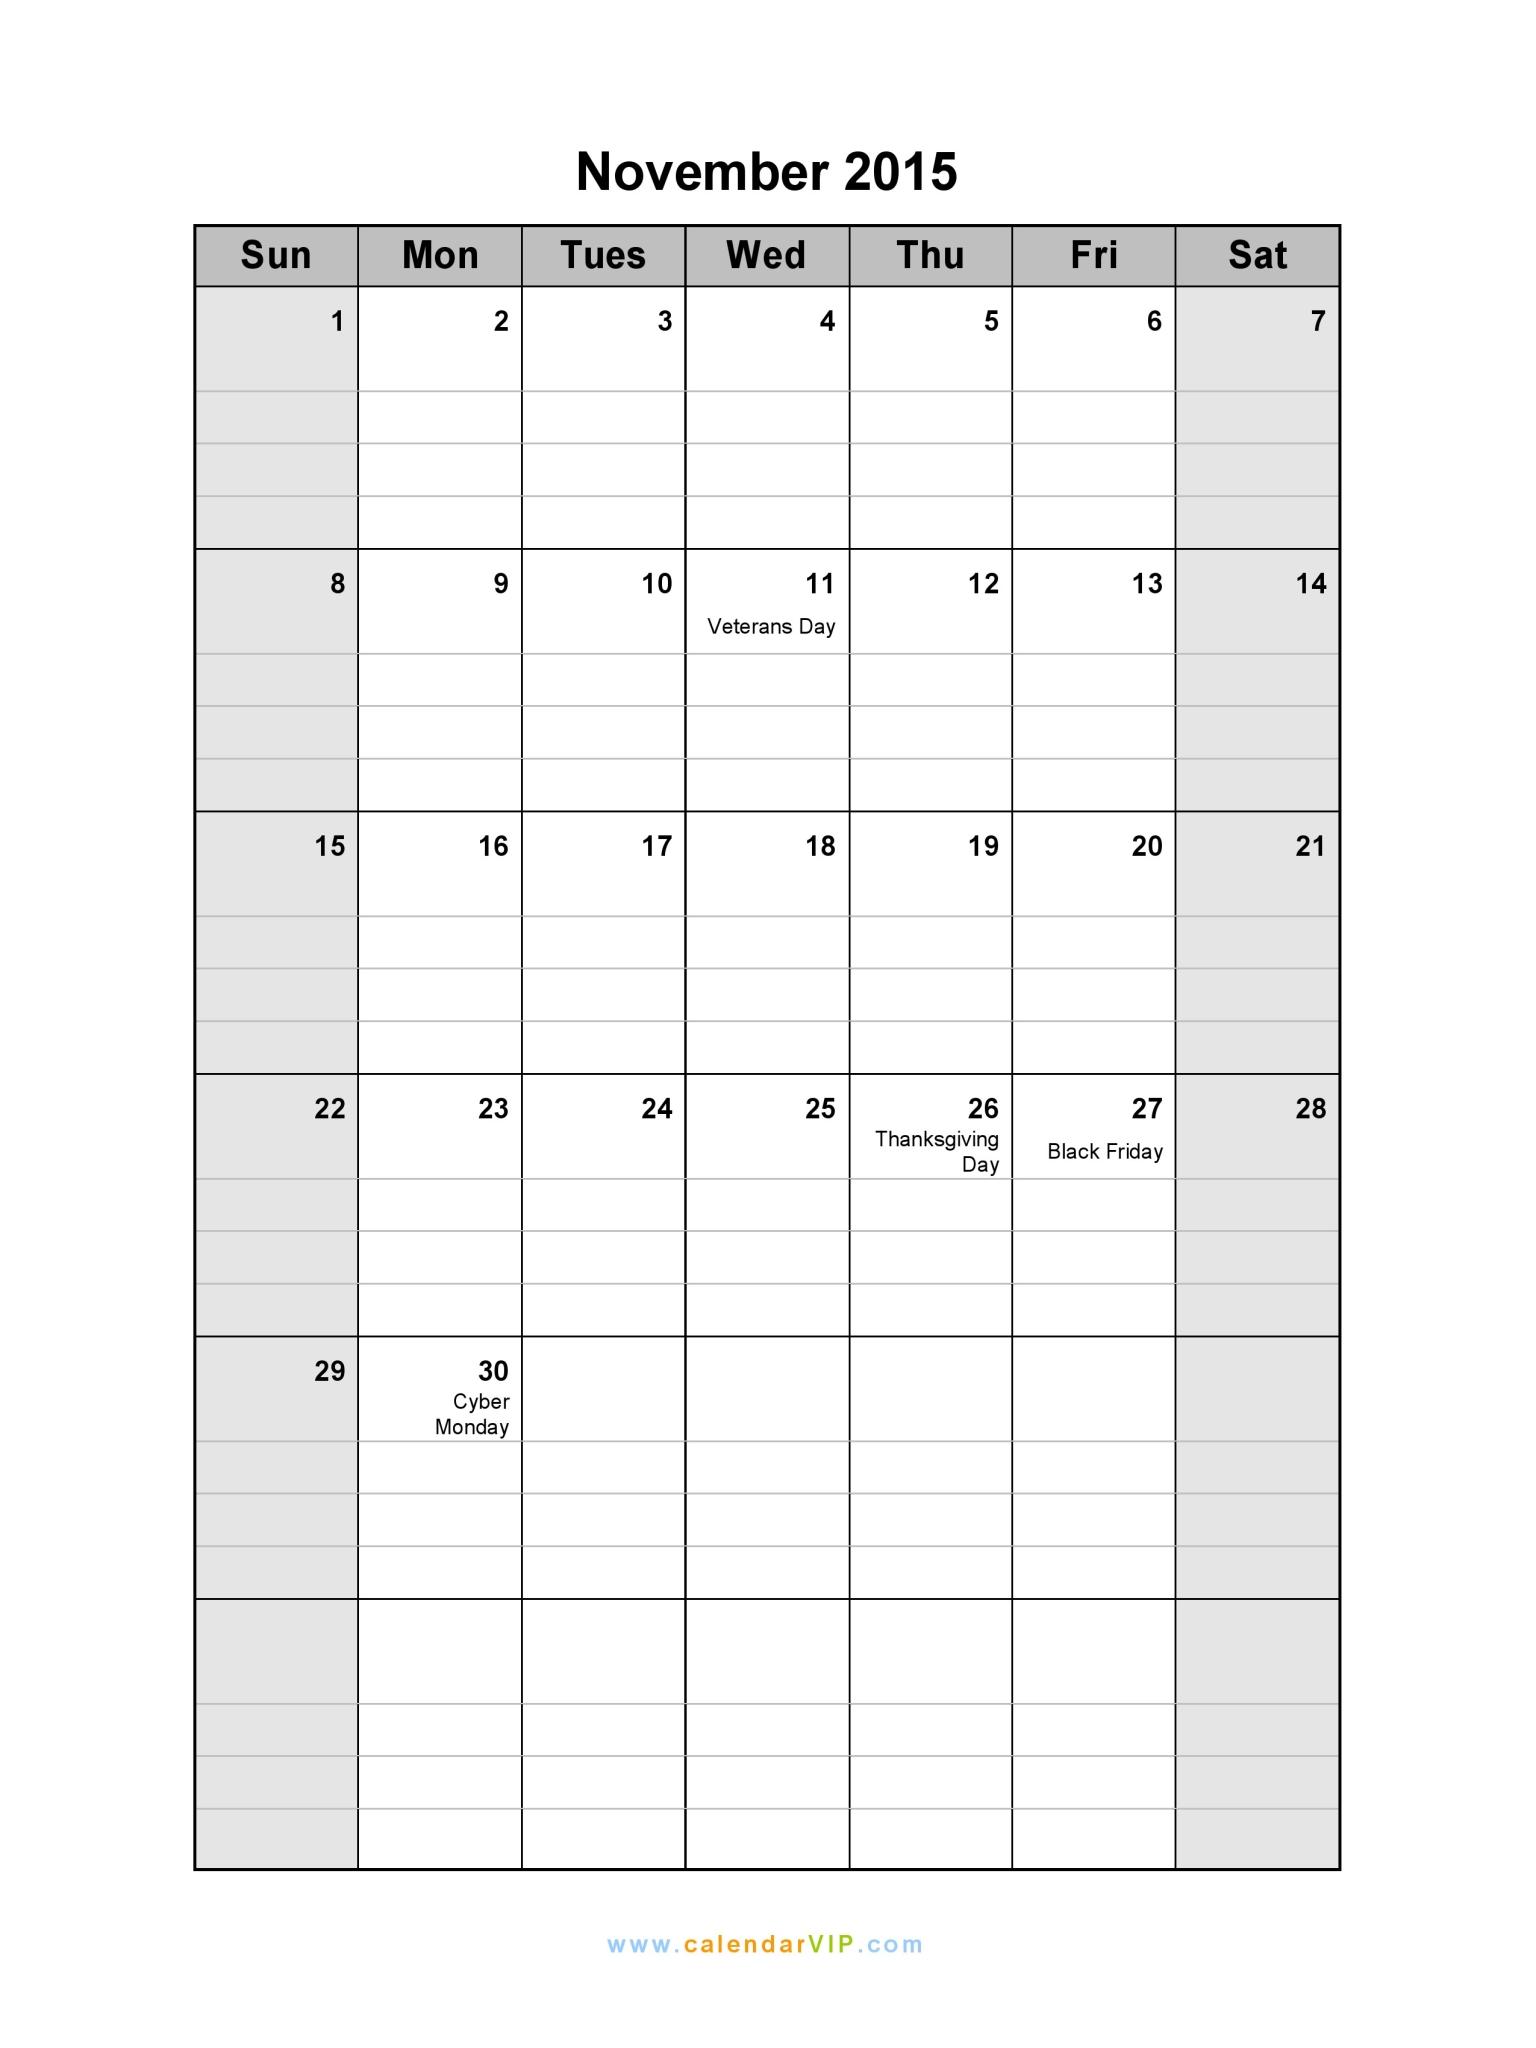 november 2015 calendar november 2015 calendar